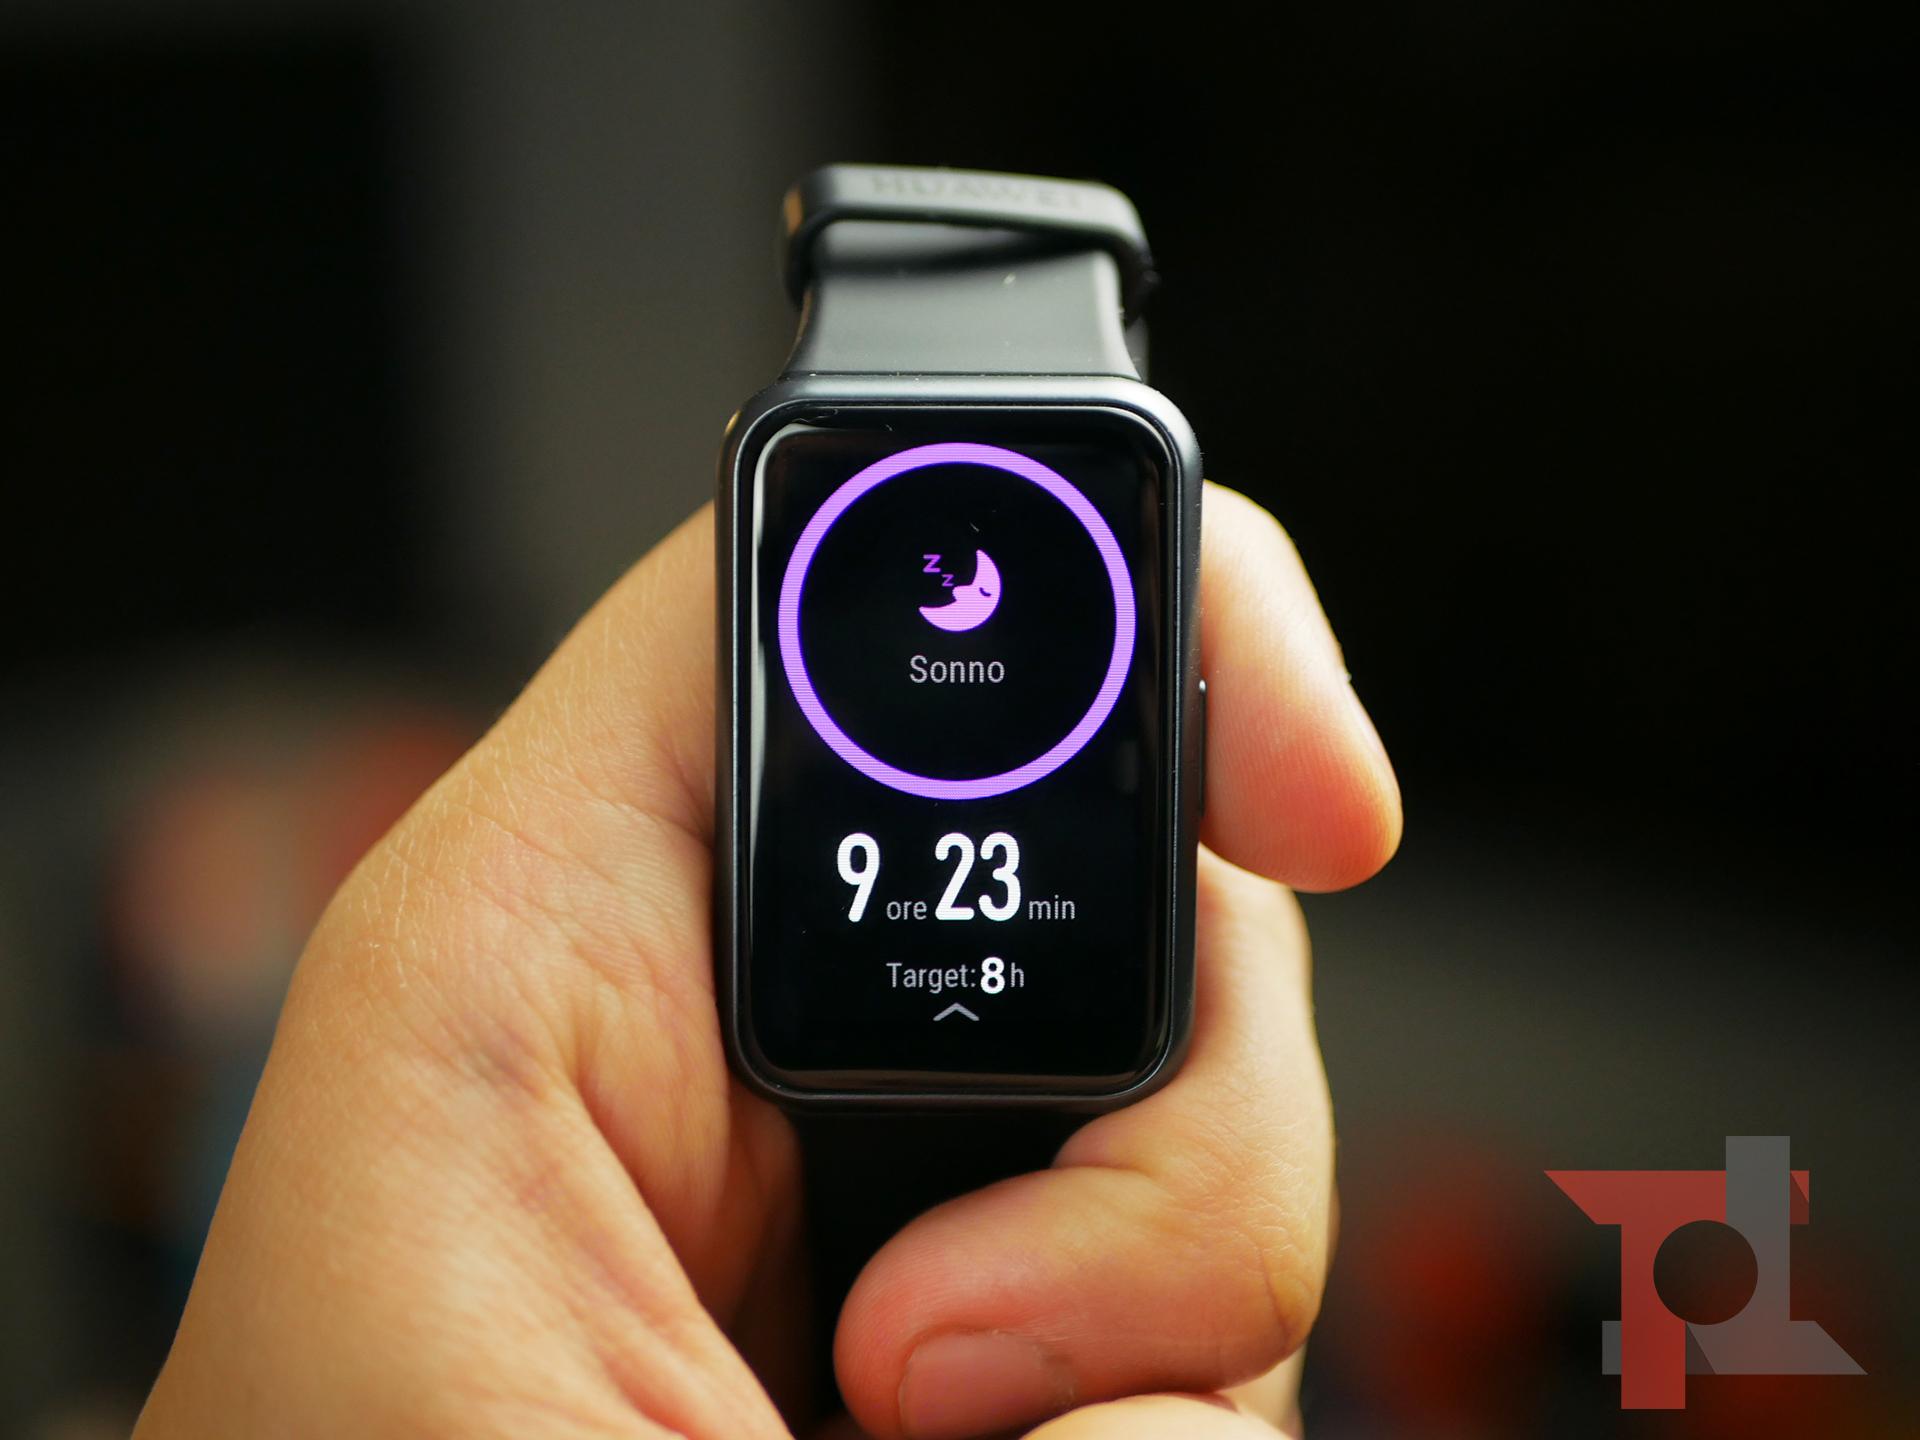 Recensione Huawei Watch Fit: uno smartwatch comodo e per sportivi 11